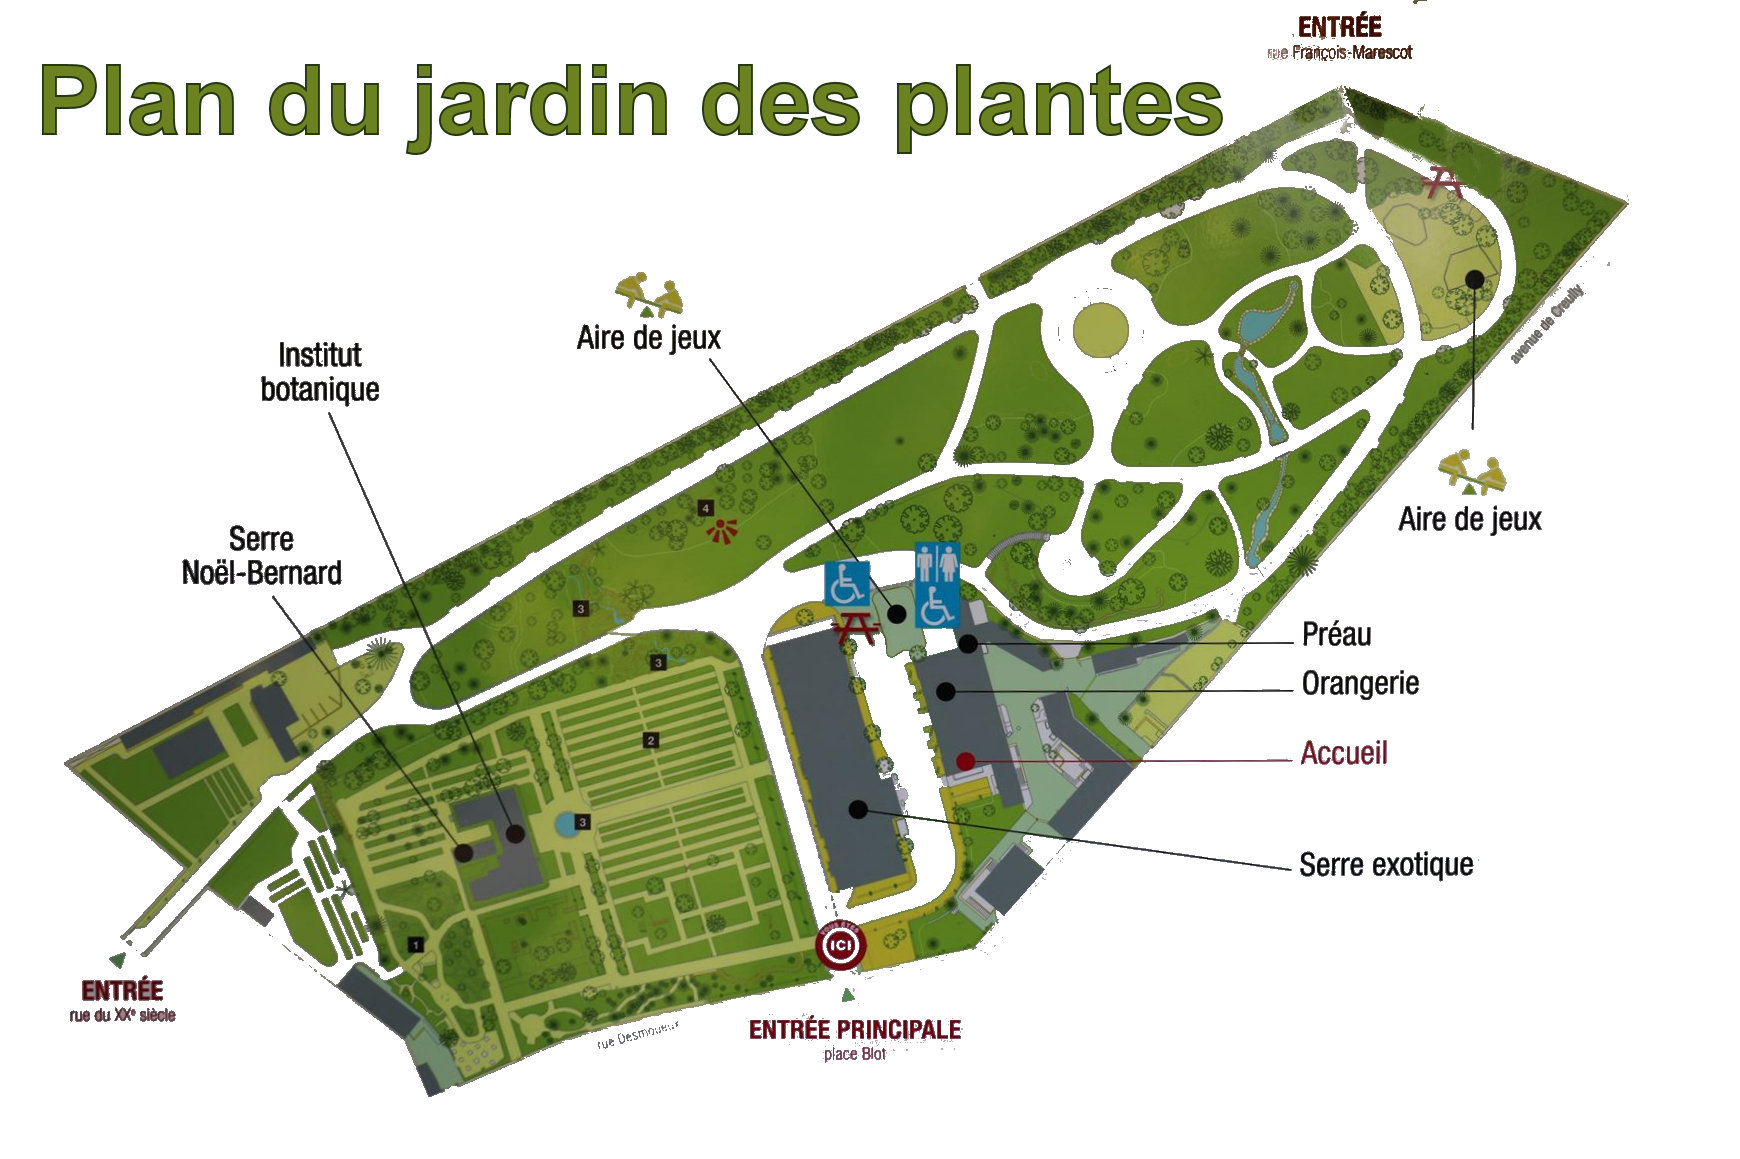 Jardin des plantes de Caen CP